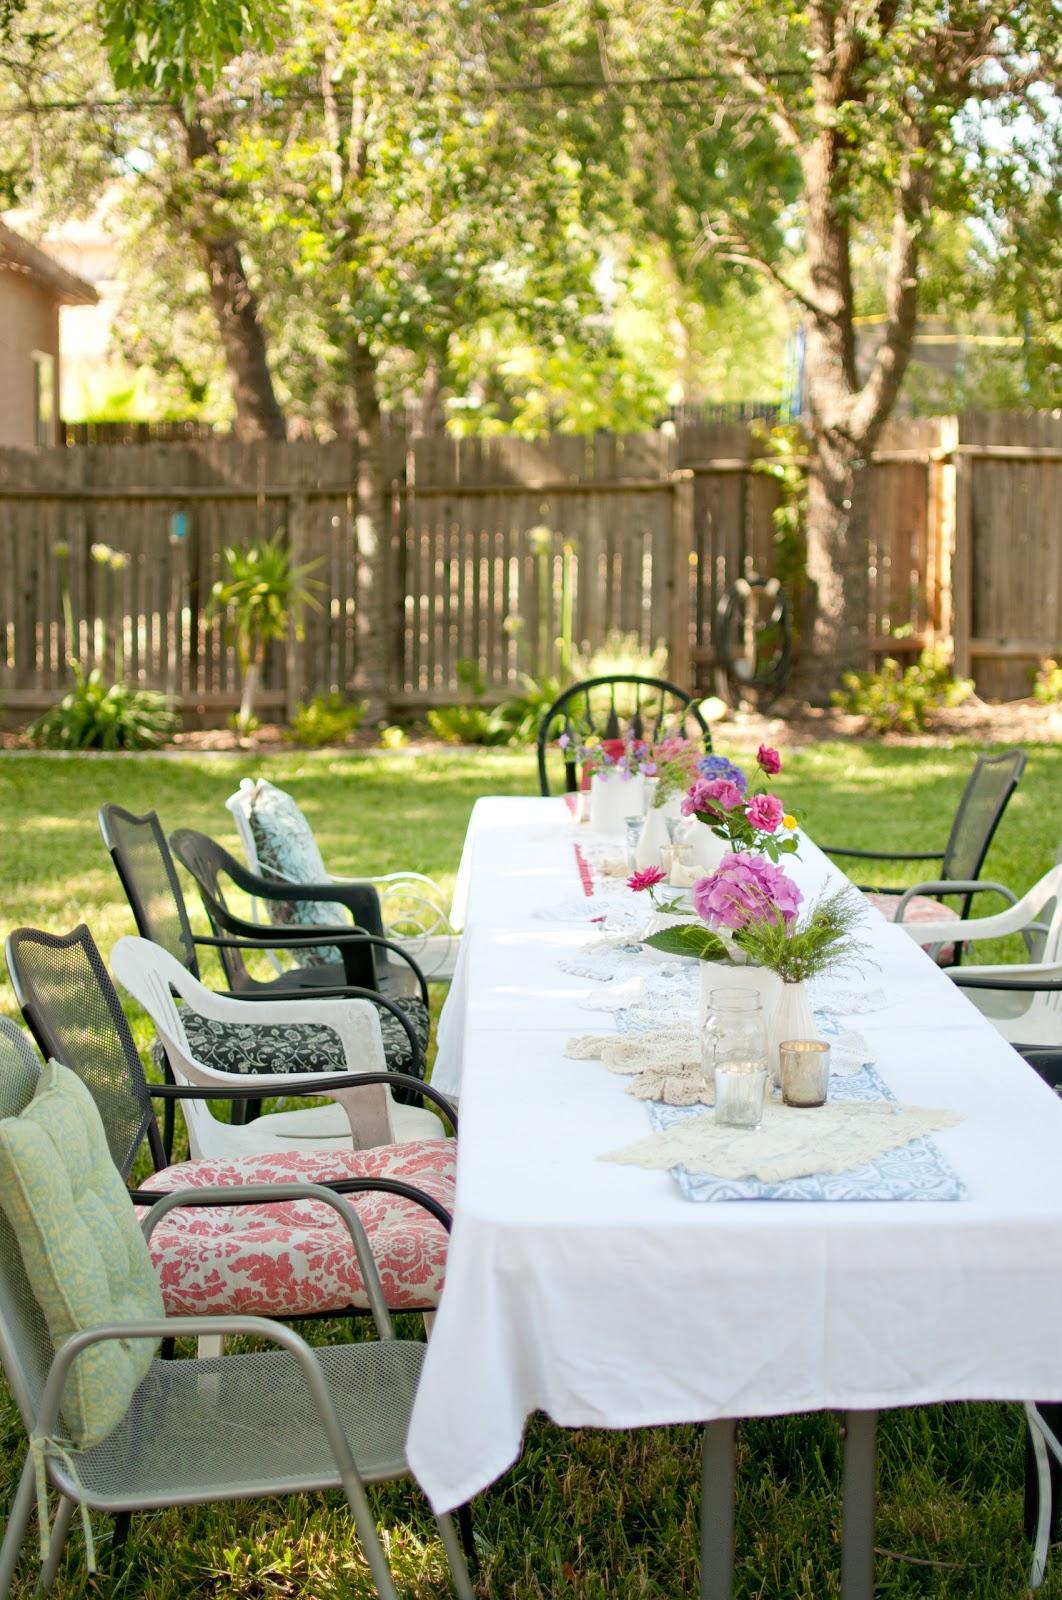 Summer Backyard Birthday Party